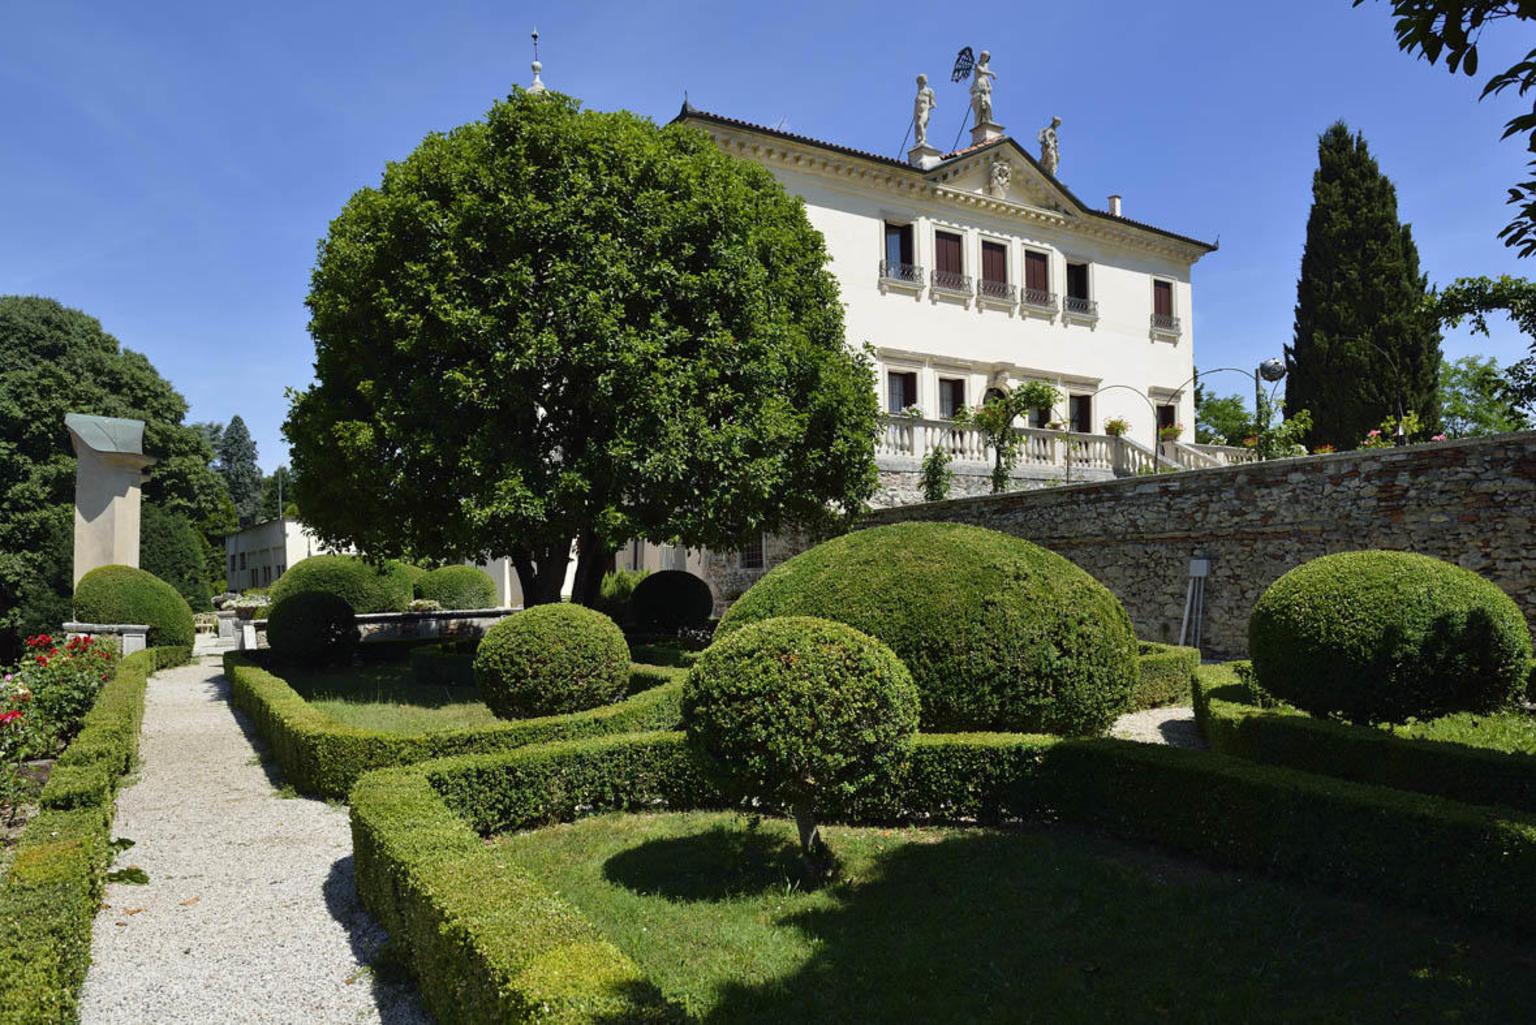 MAIS FOTOS, Villa Valmarana ai Nani in Vicenza - Entrance Ticket